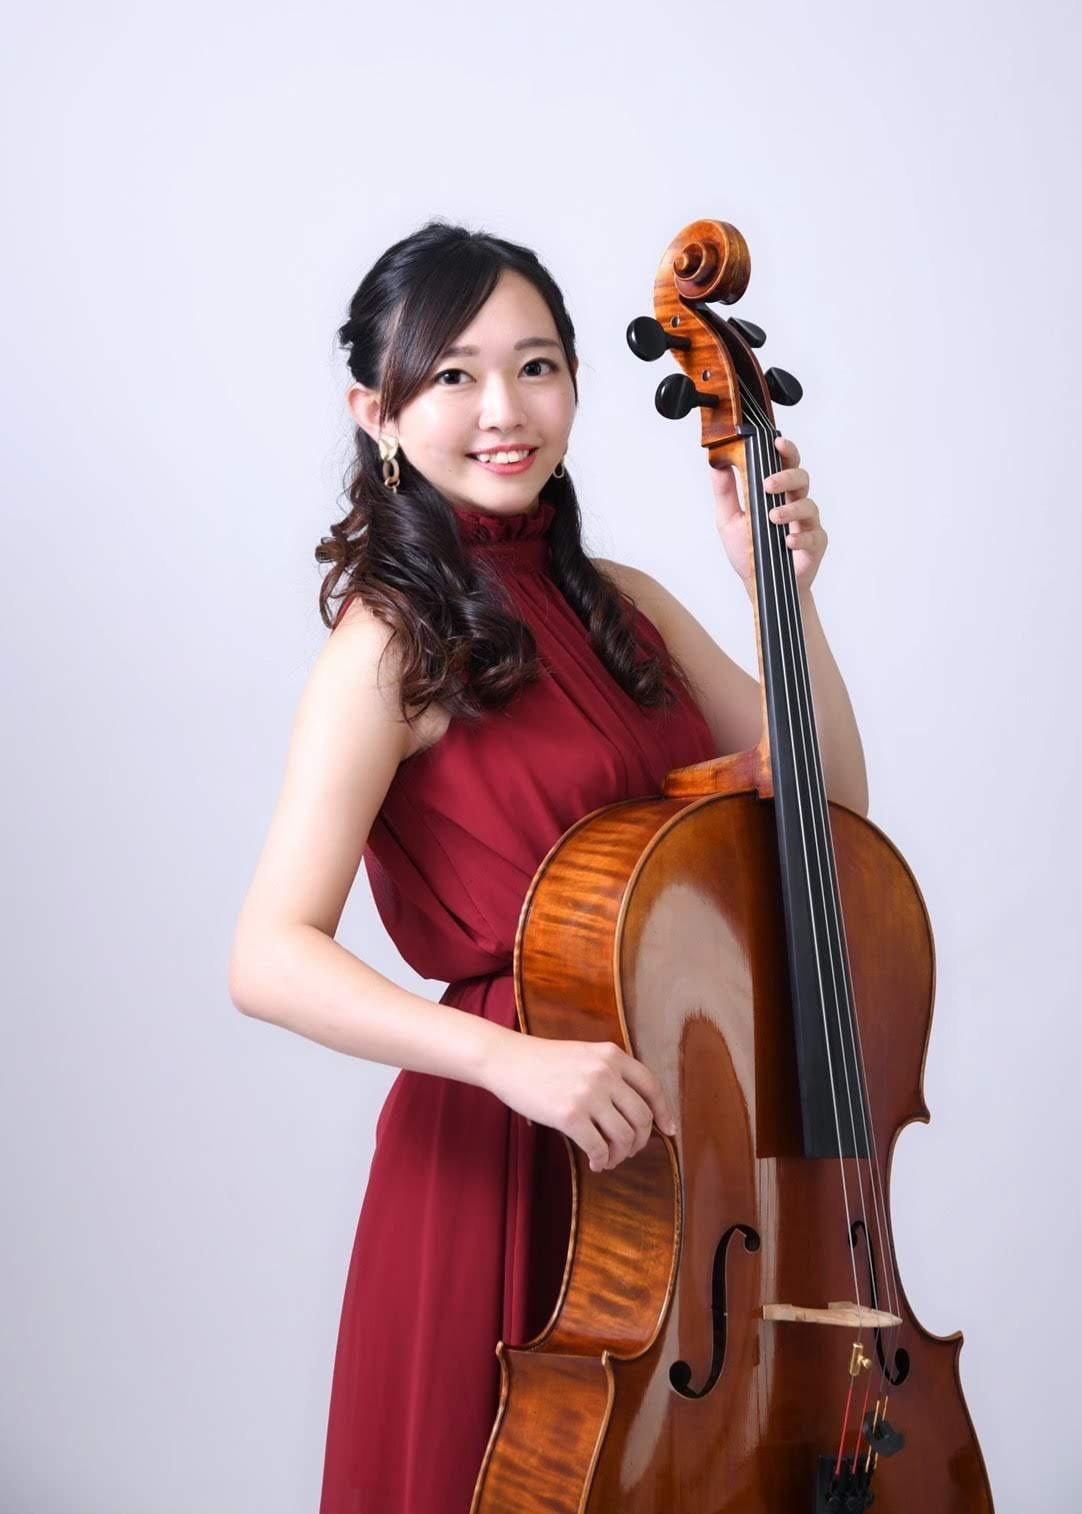 Violin&Cello Duo Concert(福岡)のイメージその3